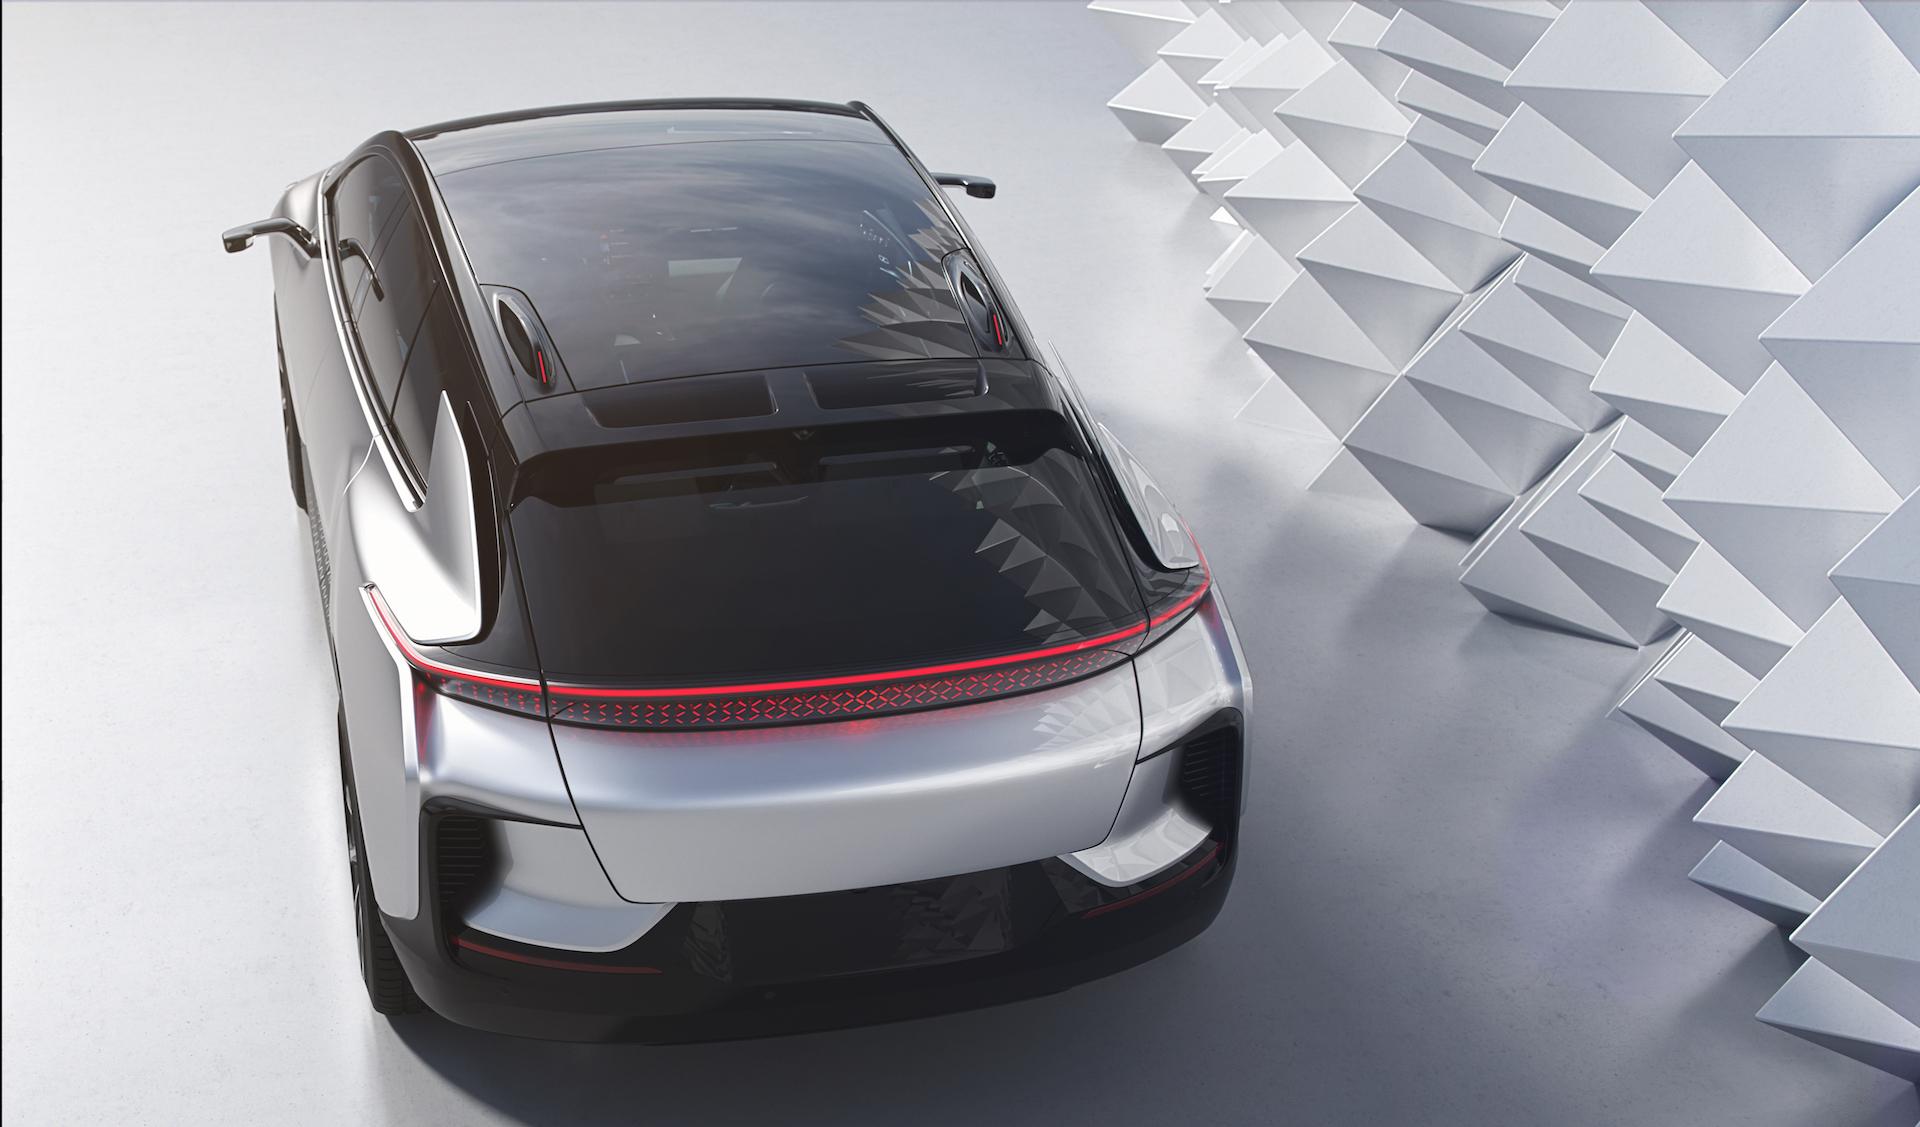 2018 Subaru WRX and WRX STI, Faraday Future FF 91, 2020 Audi Q8